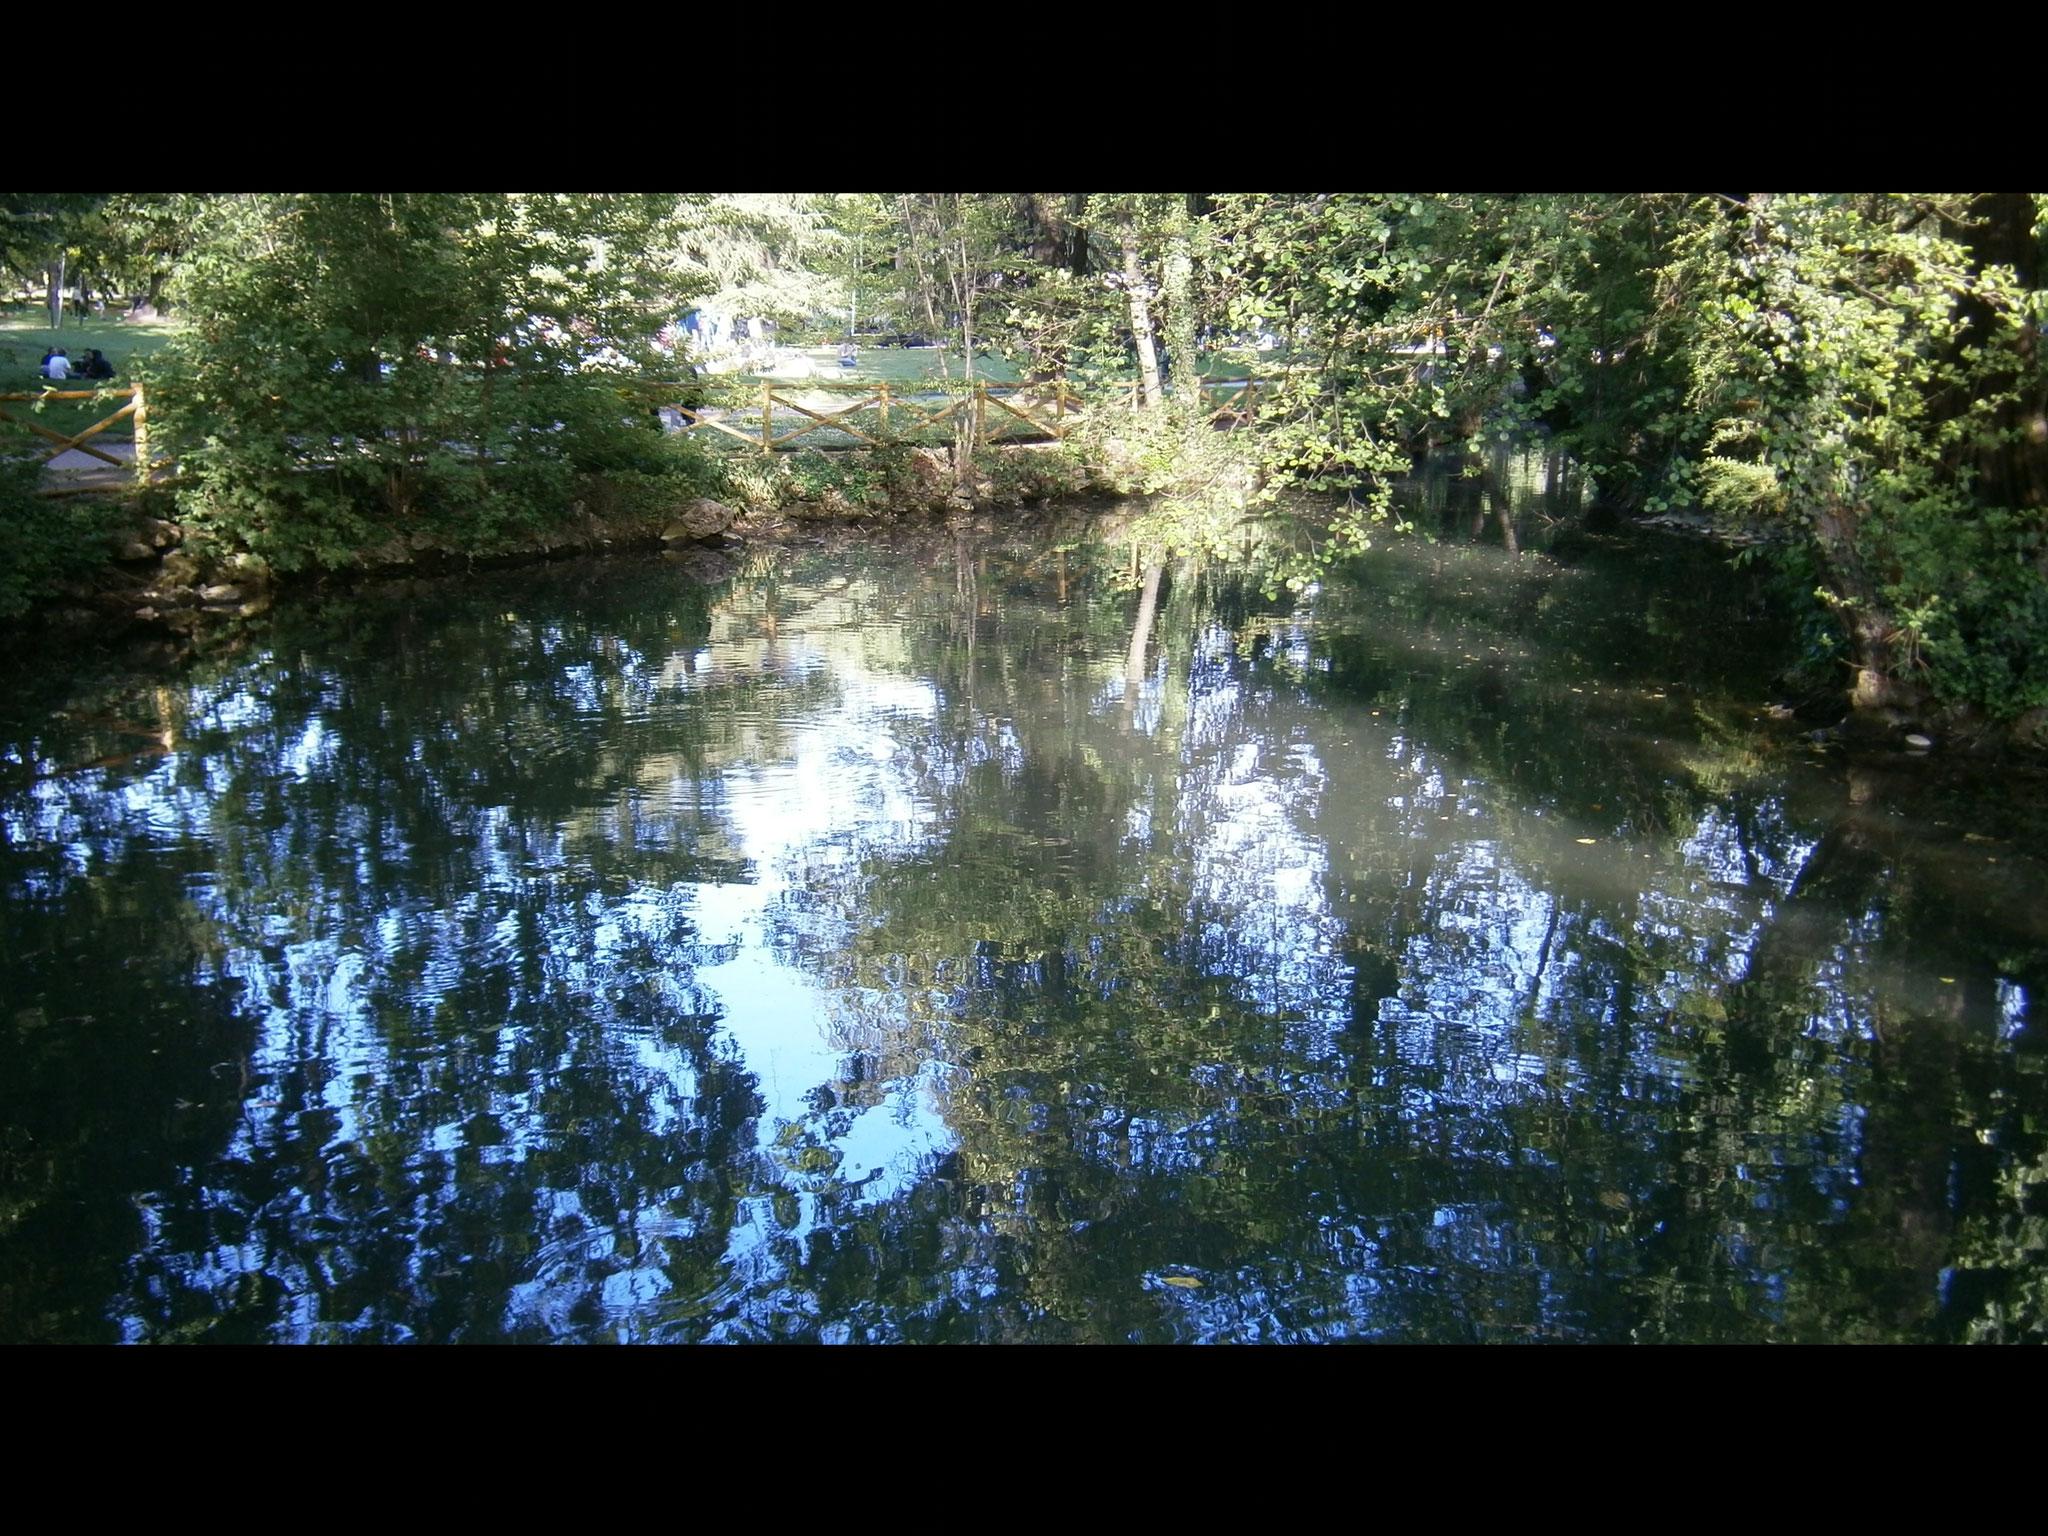 Giardini Pubblici Indro Montanelli:Lago, museo, edificios históricos, columpios y atracciones infantiles